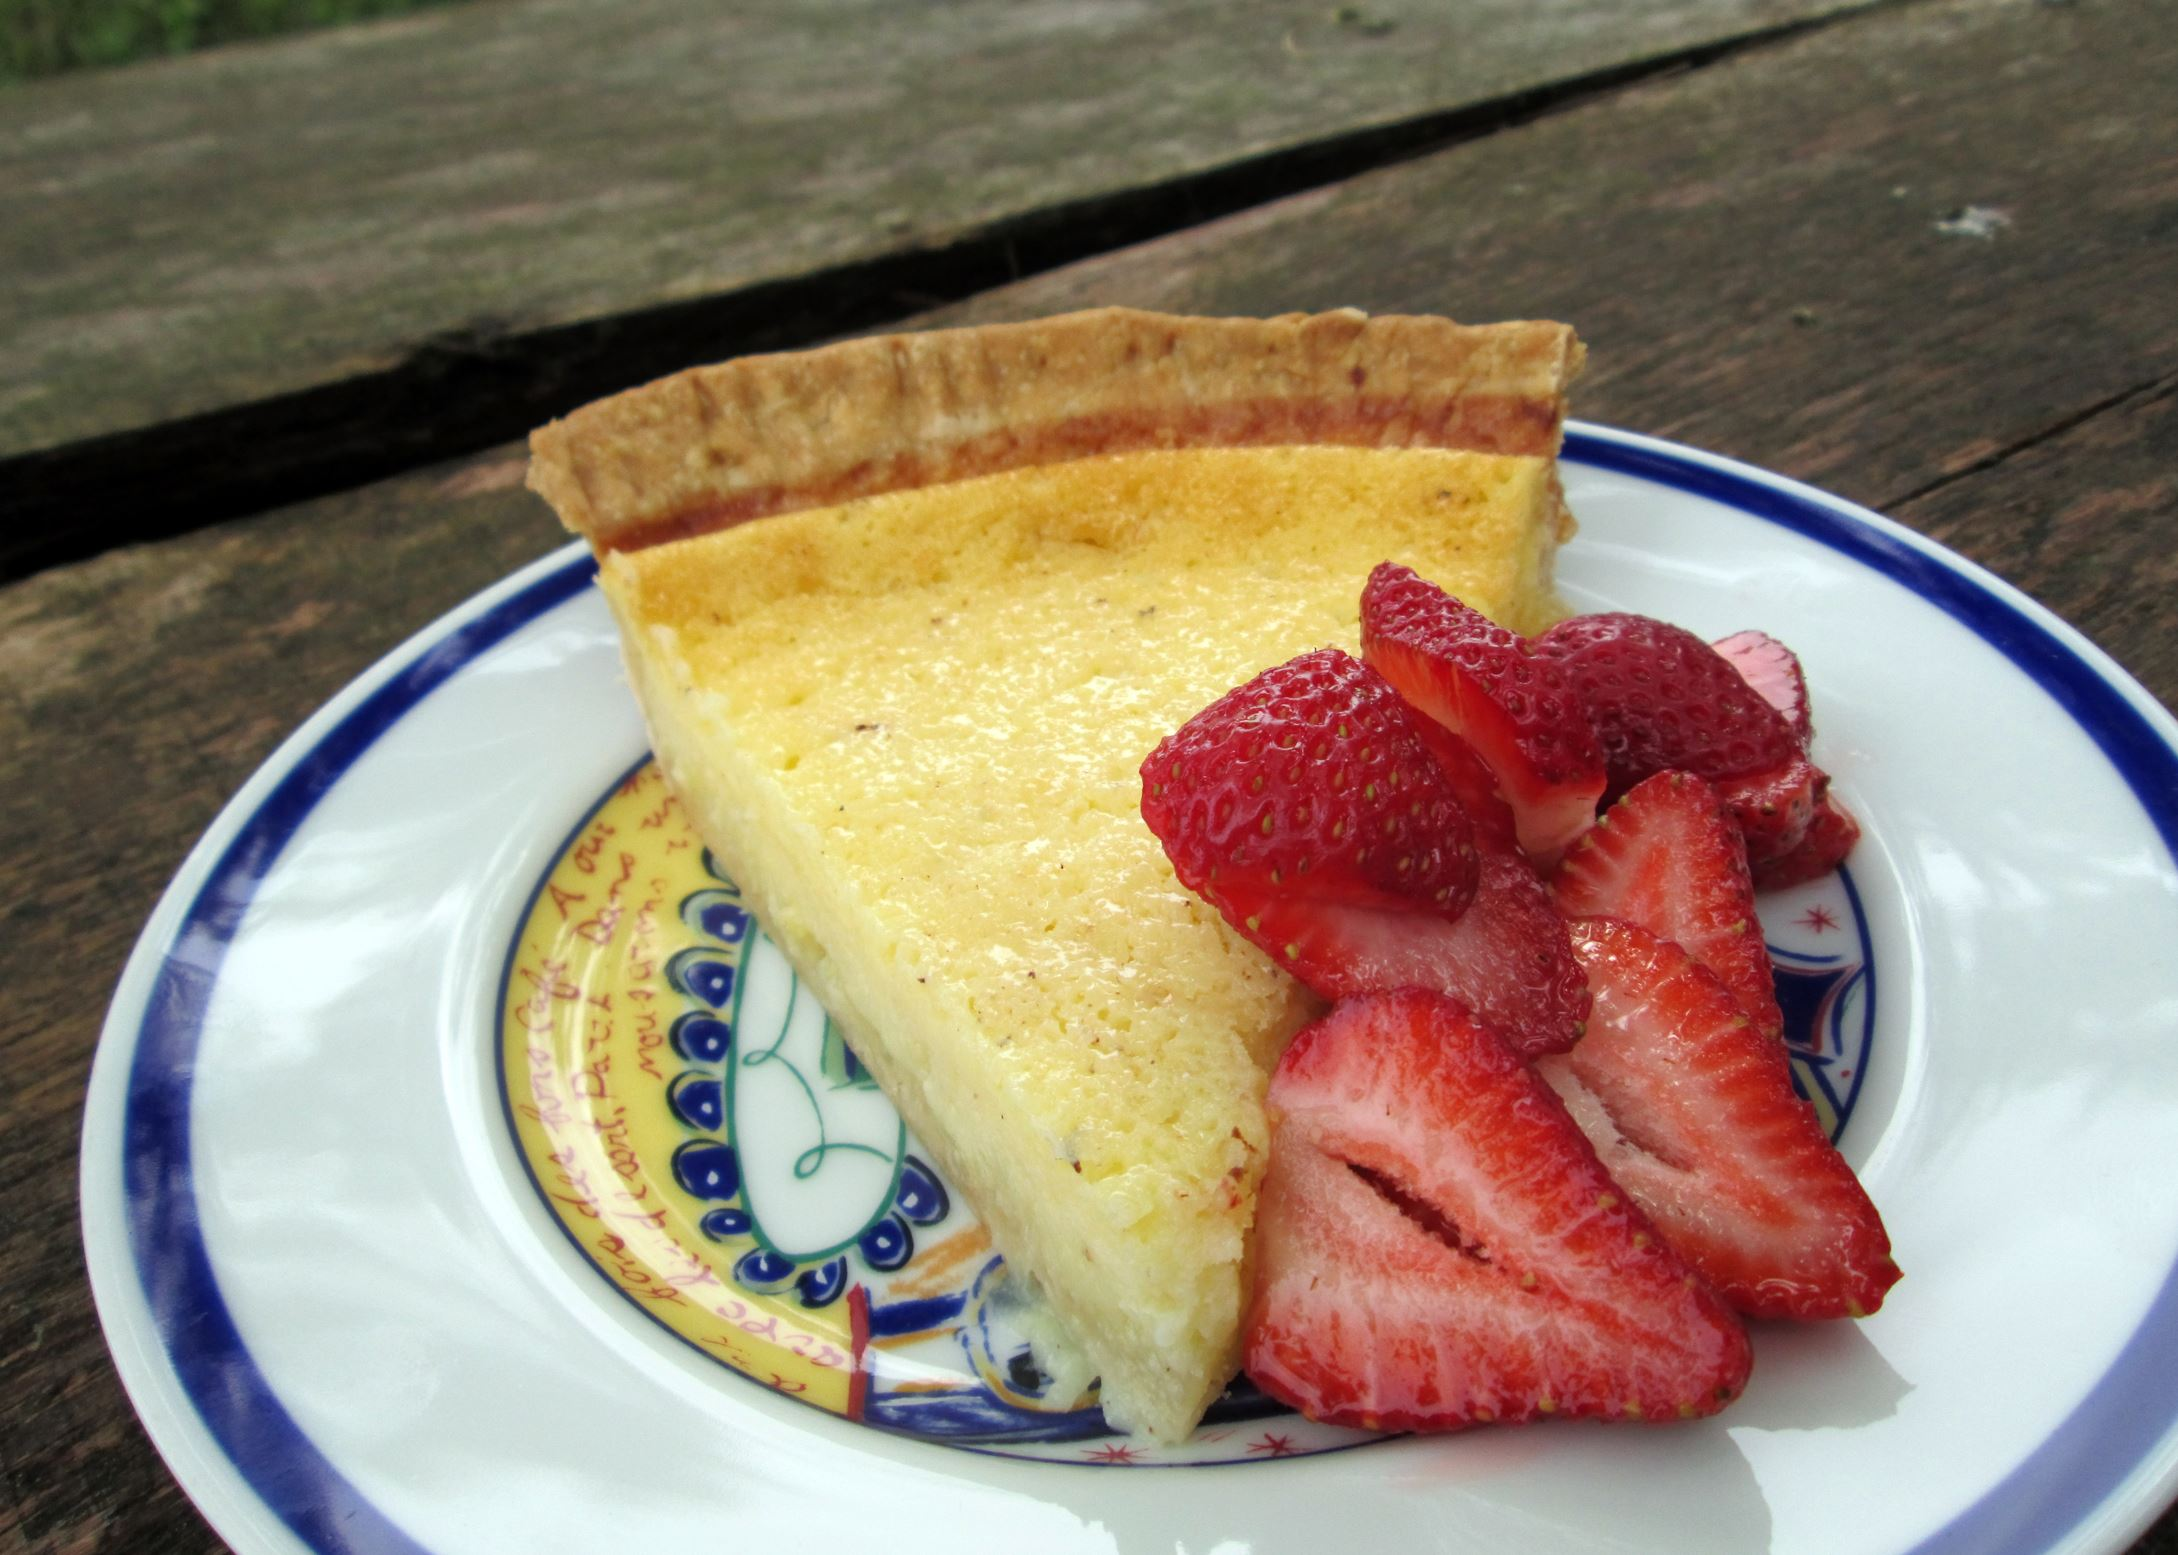 20140610hobuttermilkfood1491 Robert Stehling's Buttermilk Pie.